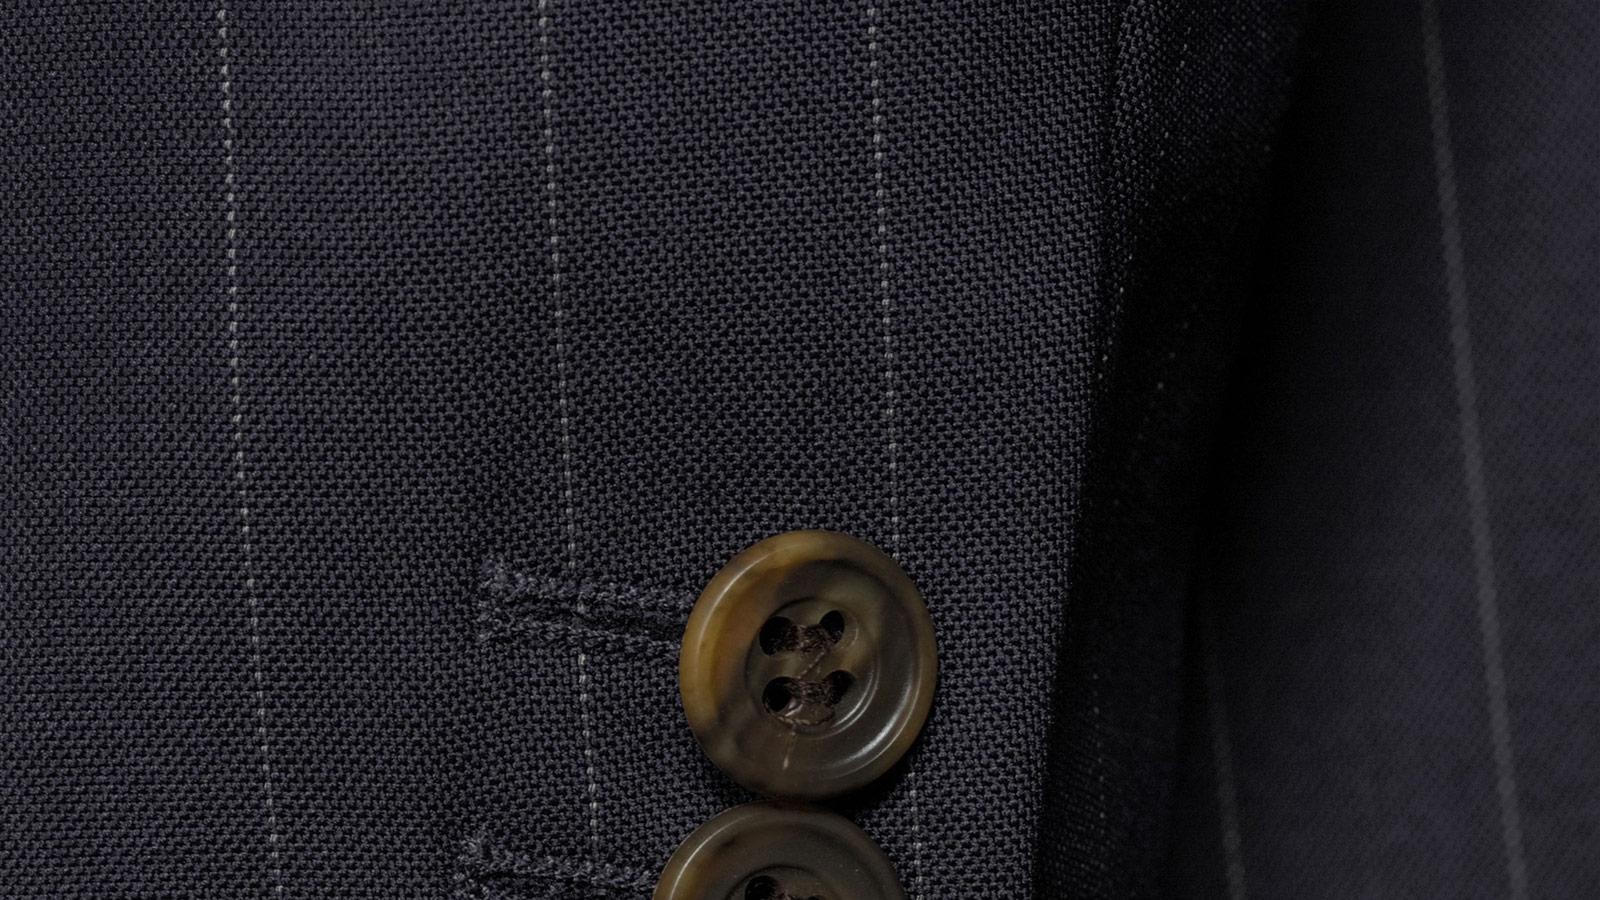 Vendetta Premium Navy Pinstripe Suit - slider image 1